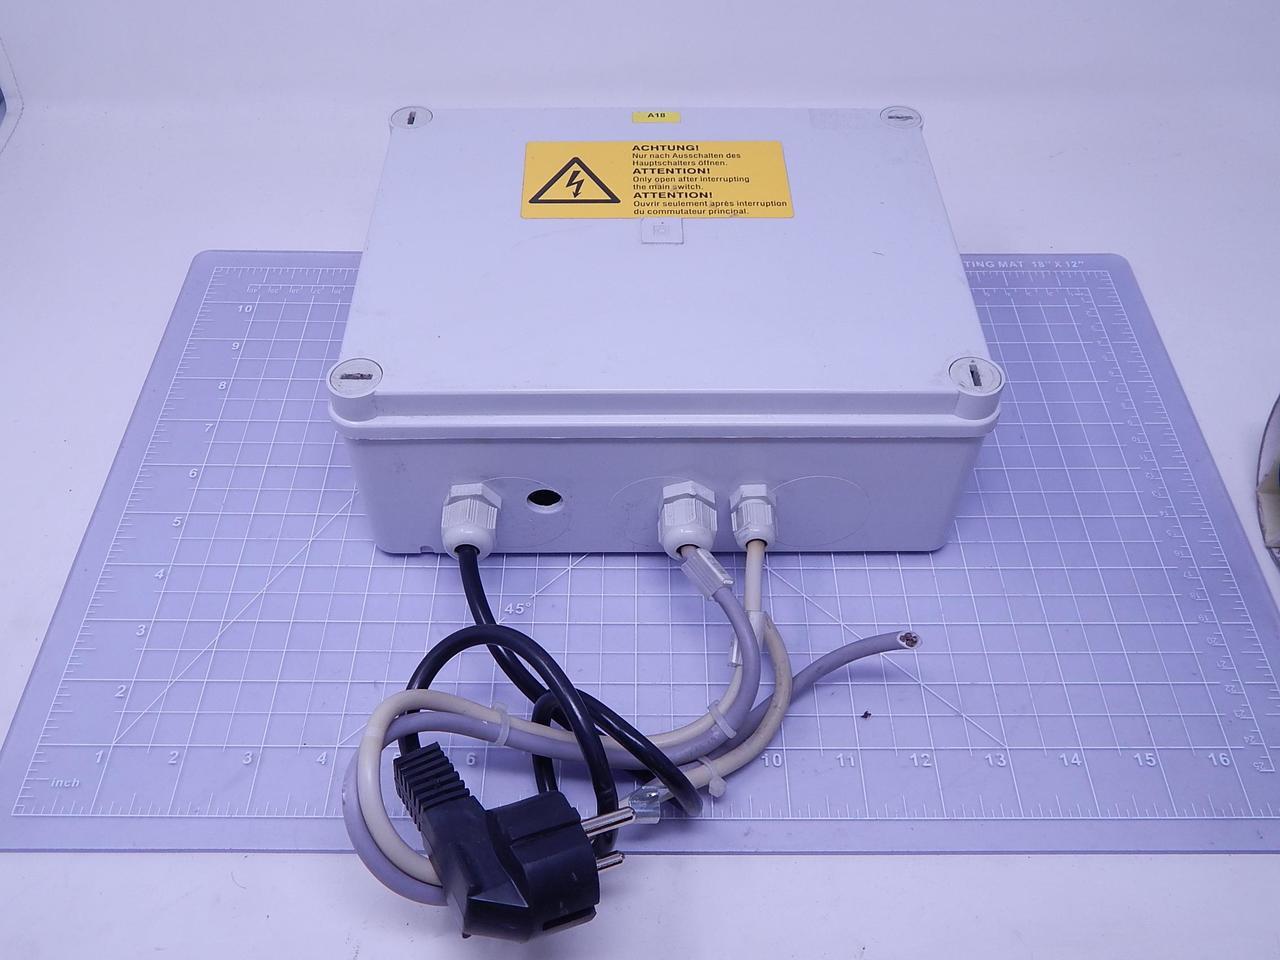 SKF CAEN 10R-V03 Control Unit For Linear Actuator T114354